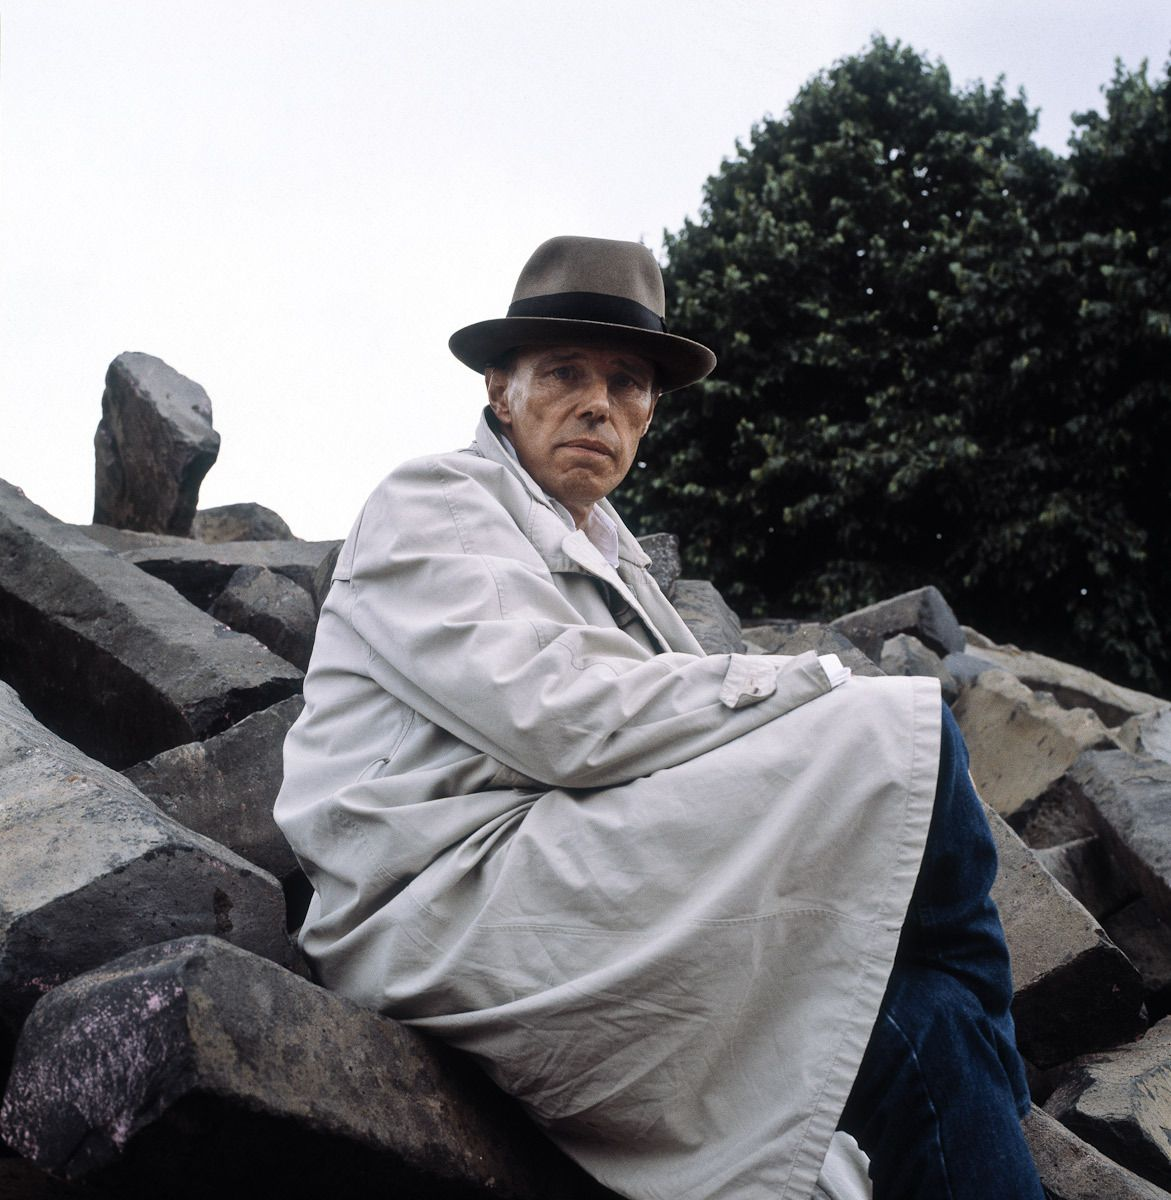 Joseph Beuys, artist